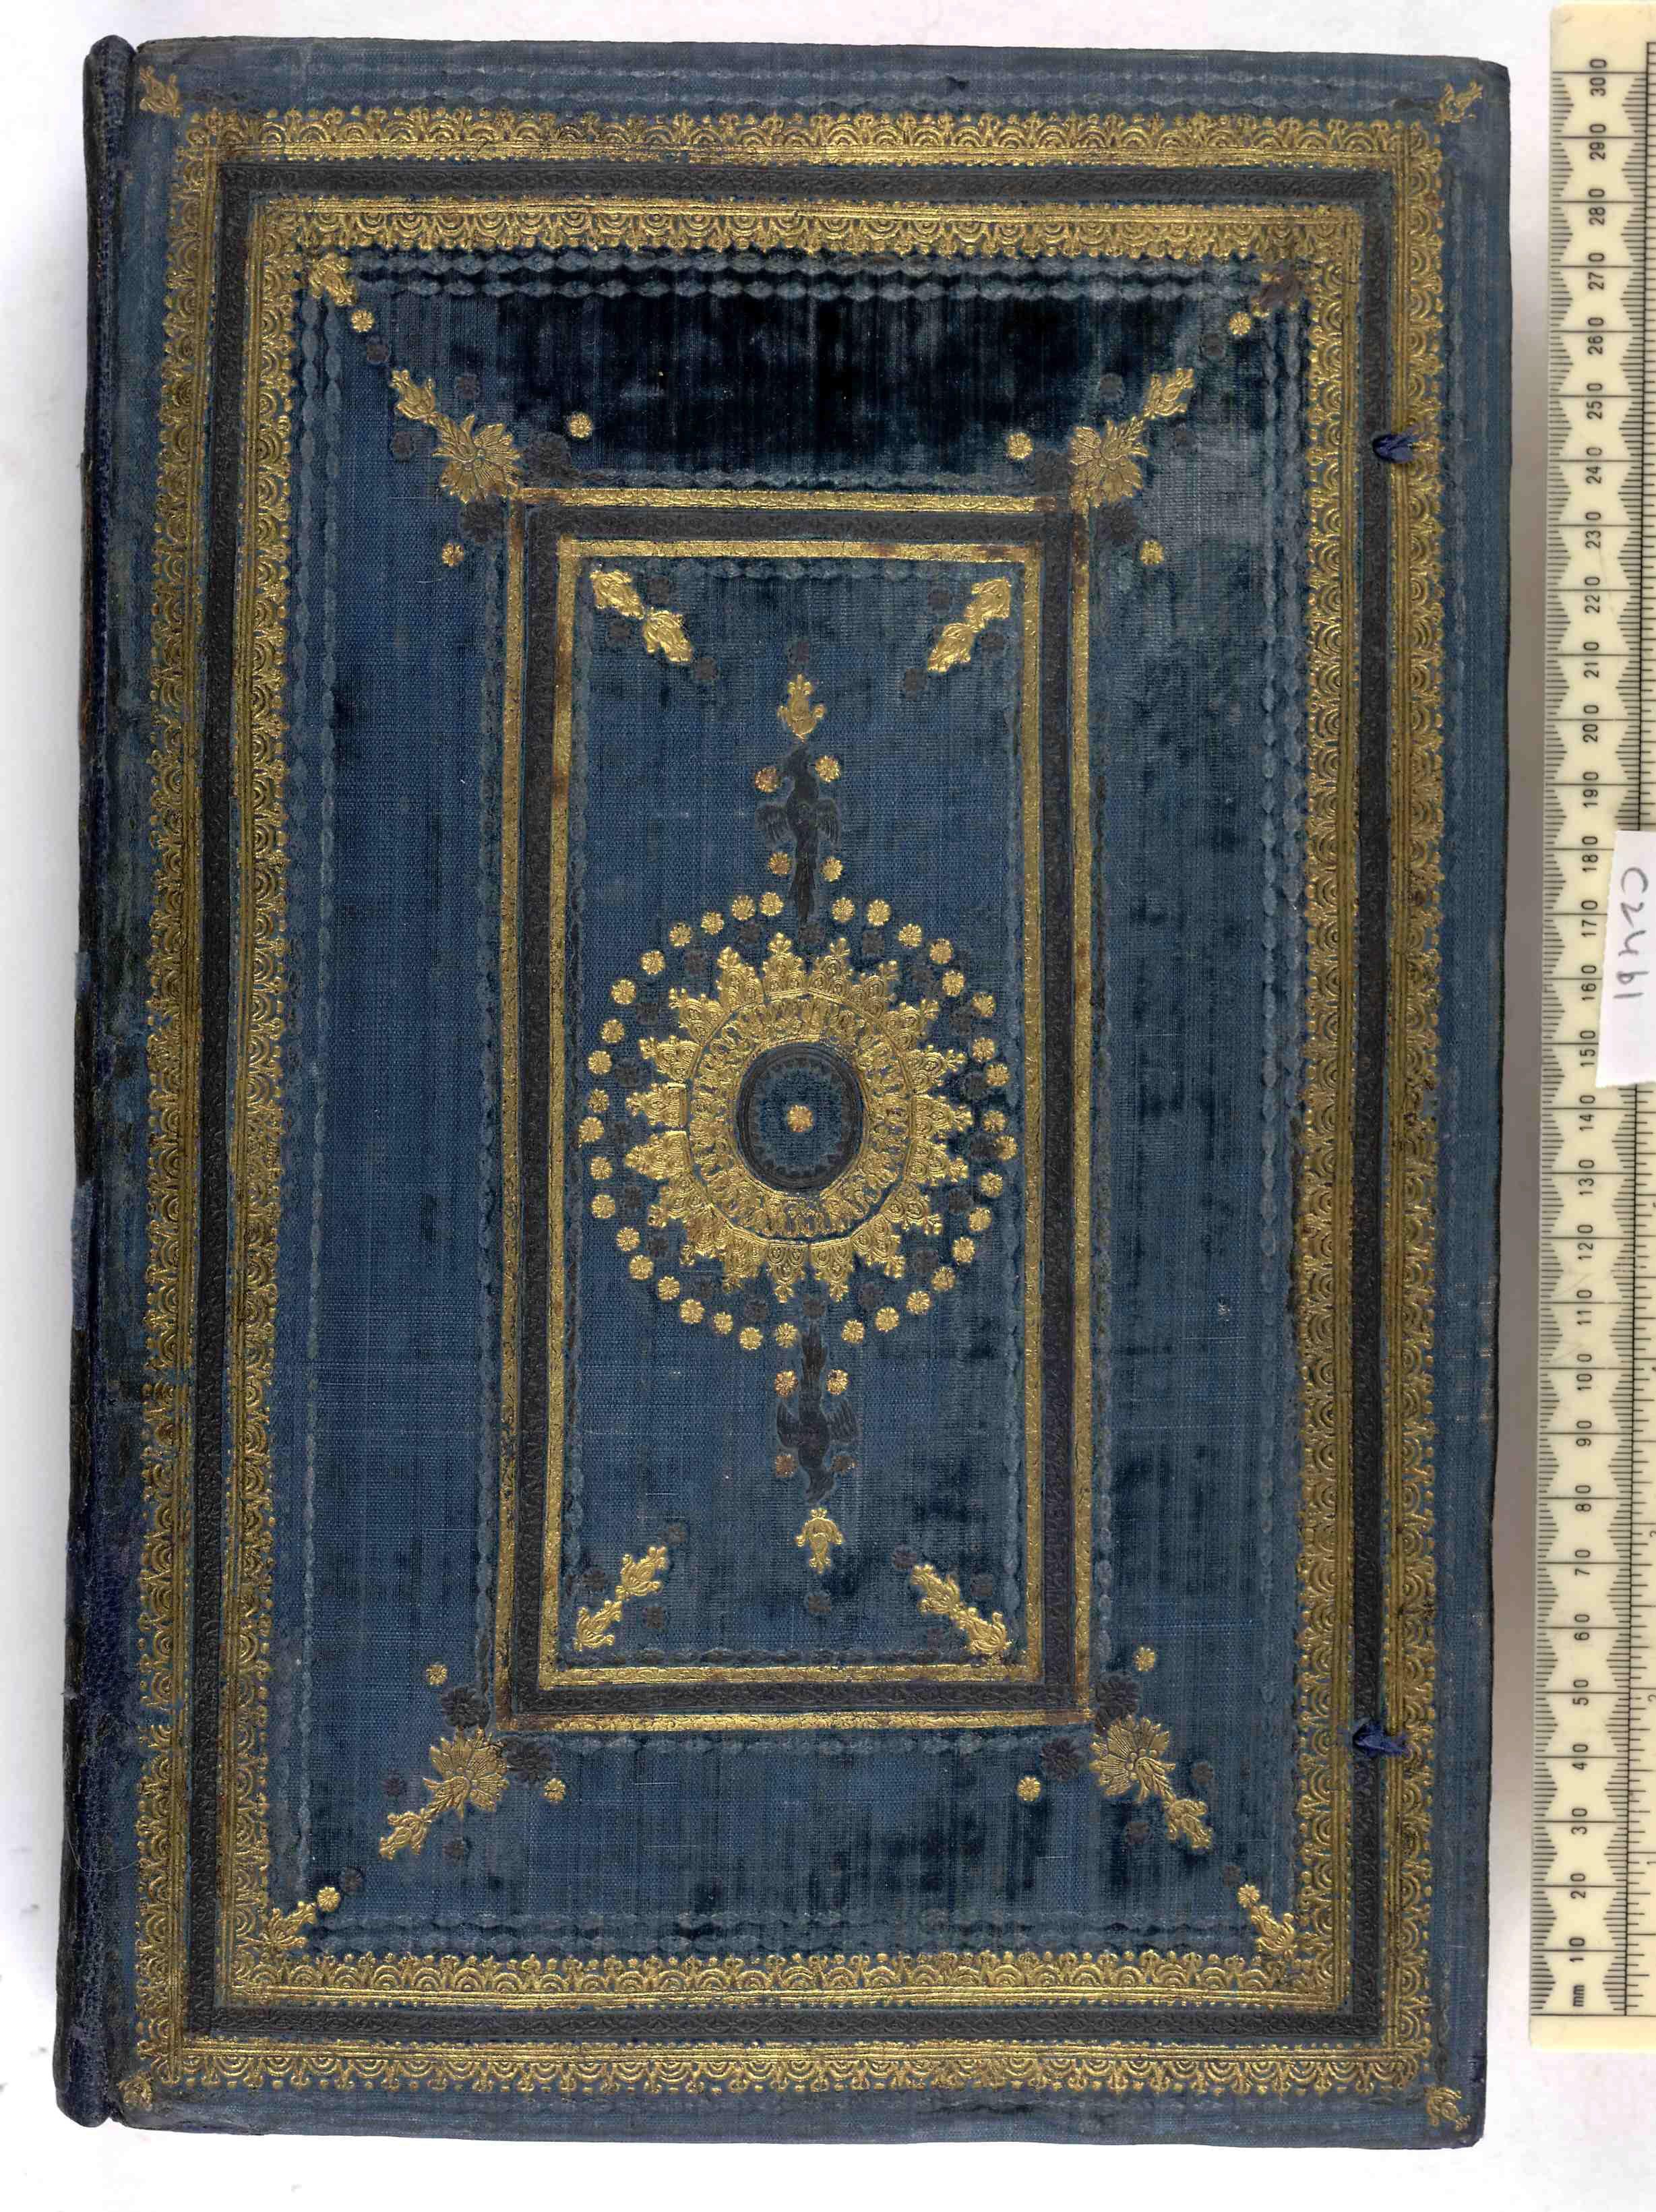 Notitia Dignitatum — Википедия